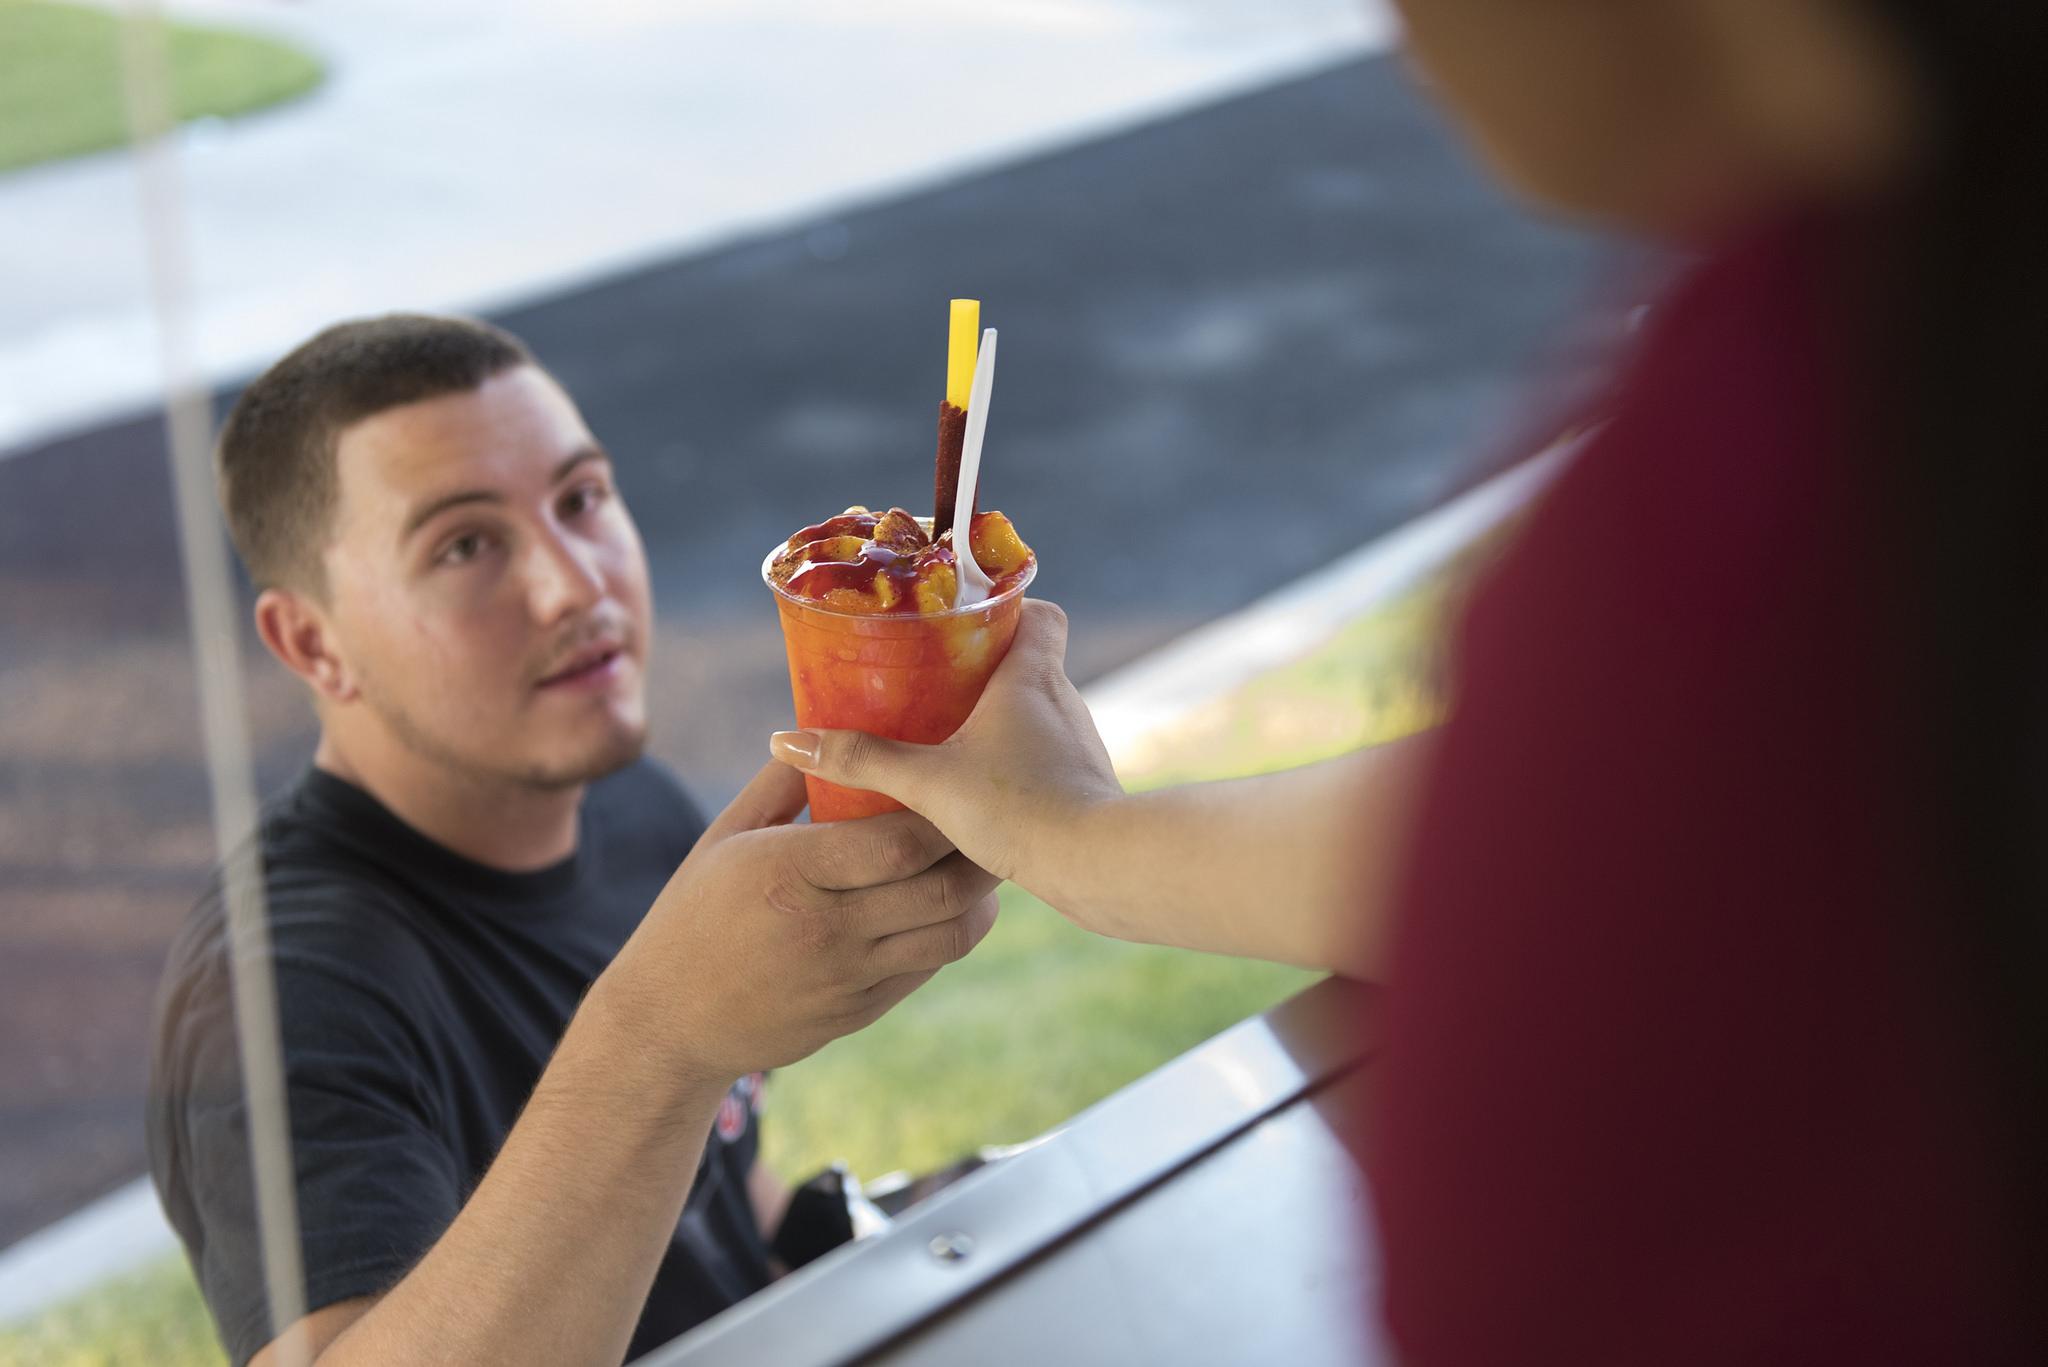 Ryan Silva, left, is handed a mangonada by Amanda Cuadra at Frankie's Ice Cream Trucks at Lewis Family Park in Las Vegas Friday, June 24, 2016. Jason Ogulnik/Las Vegas Review-Journal